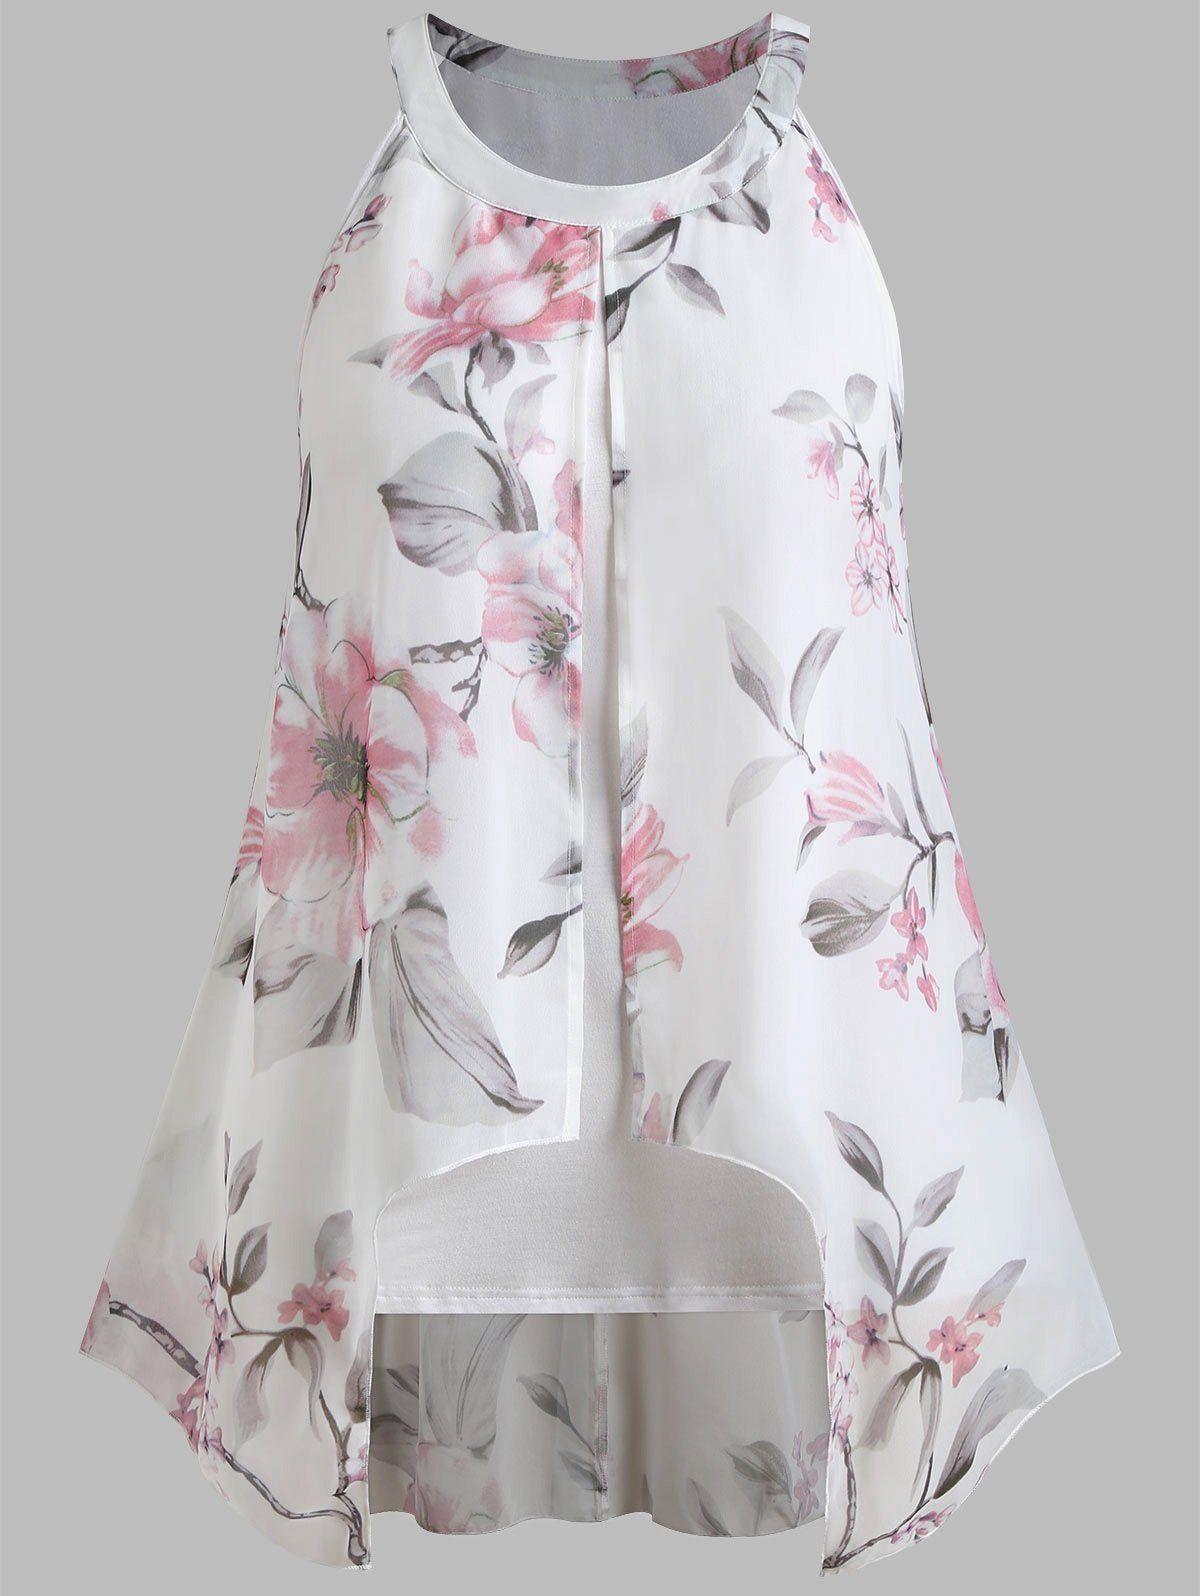 eb3f3196cbcb5d Plus Size Asymmetric Sleeveless Chiffon Blouse in 2019 | Shirts ...